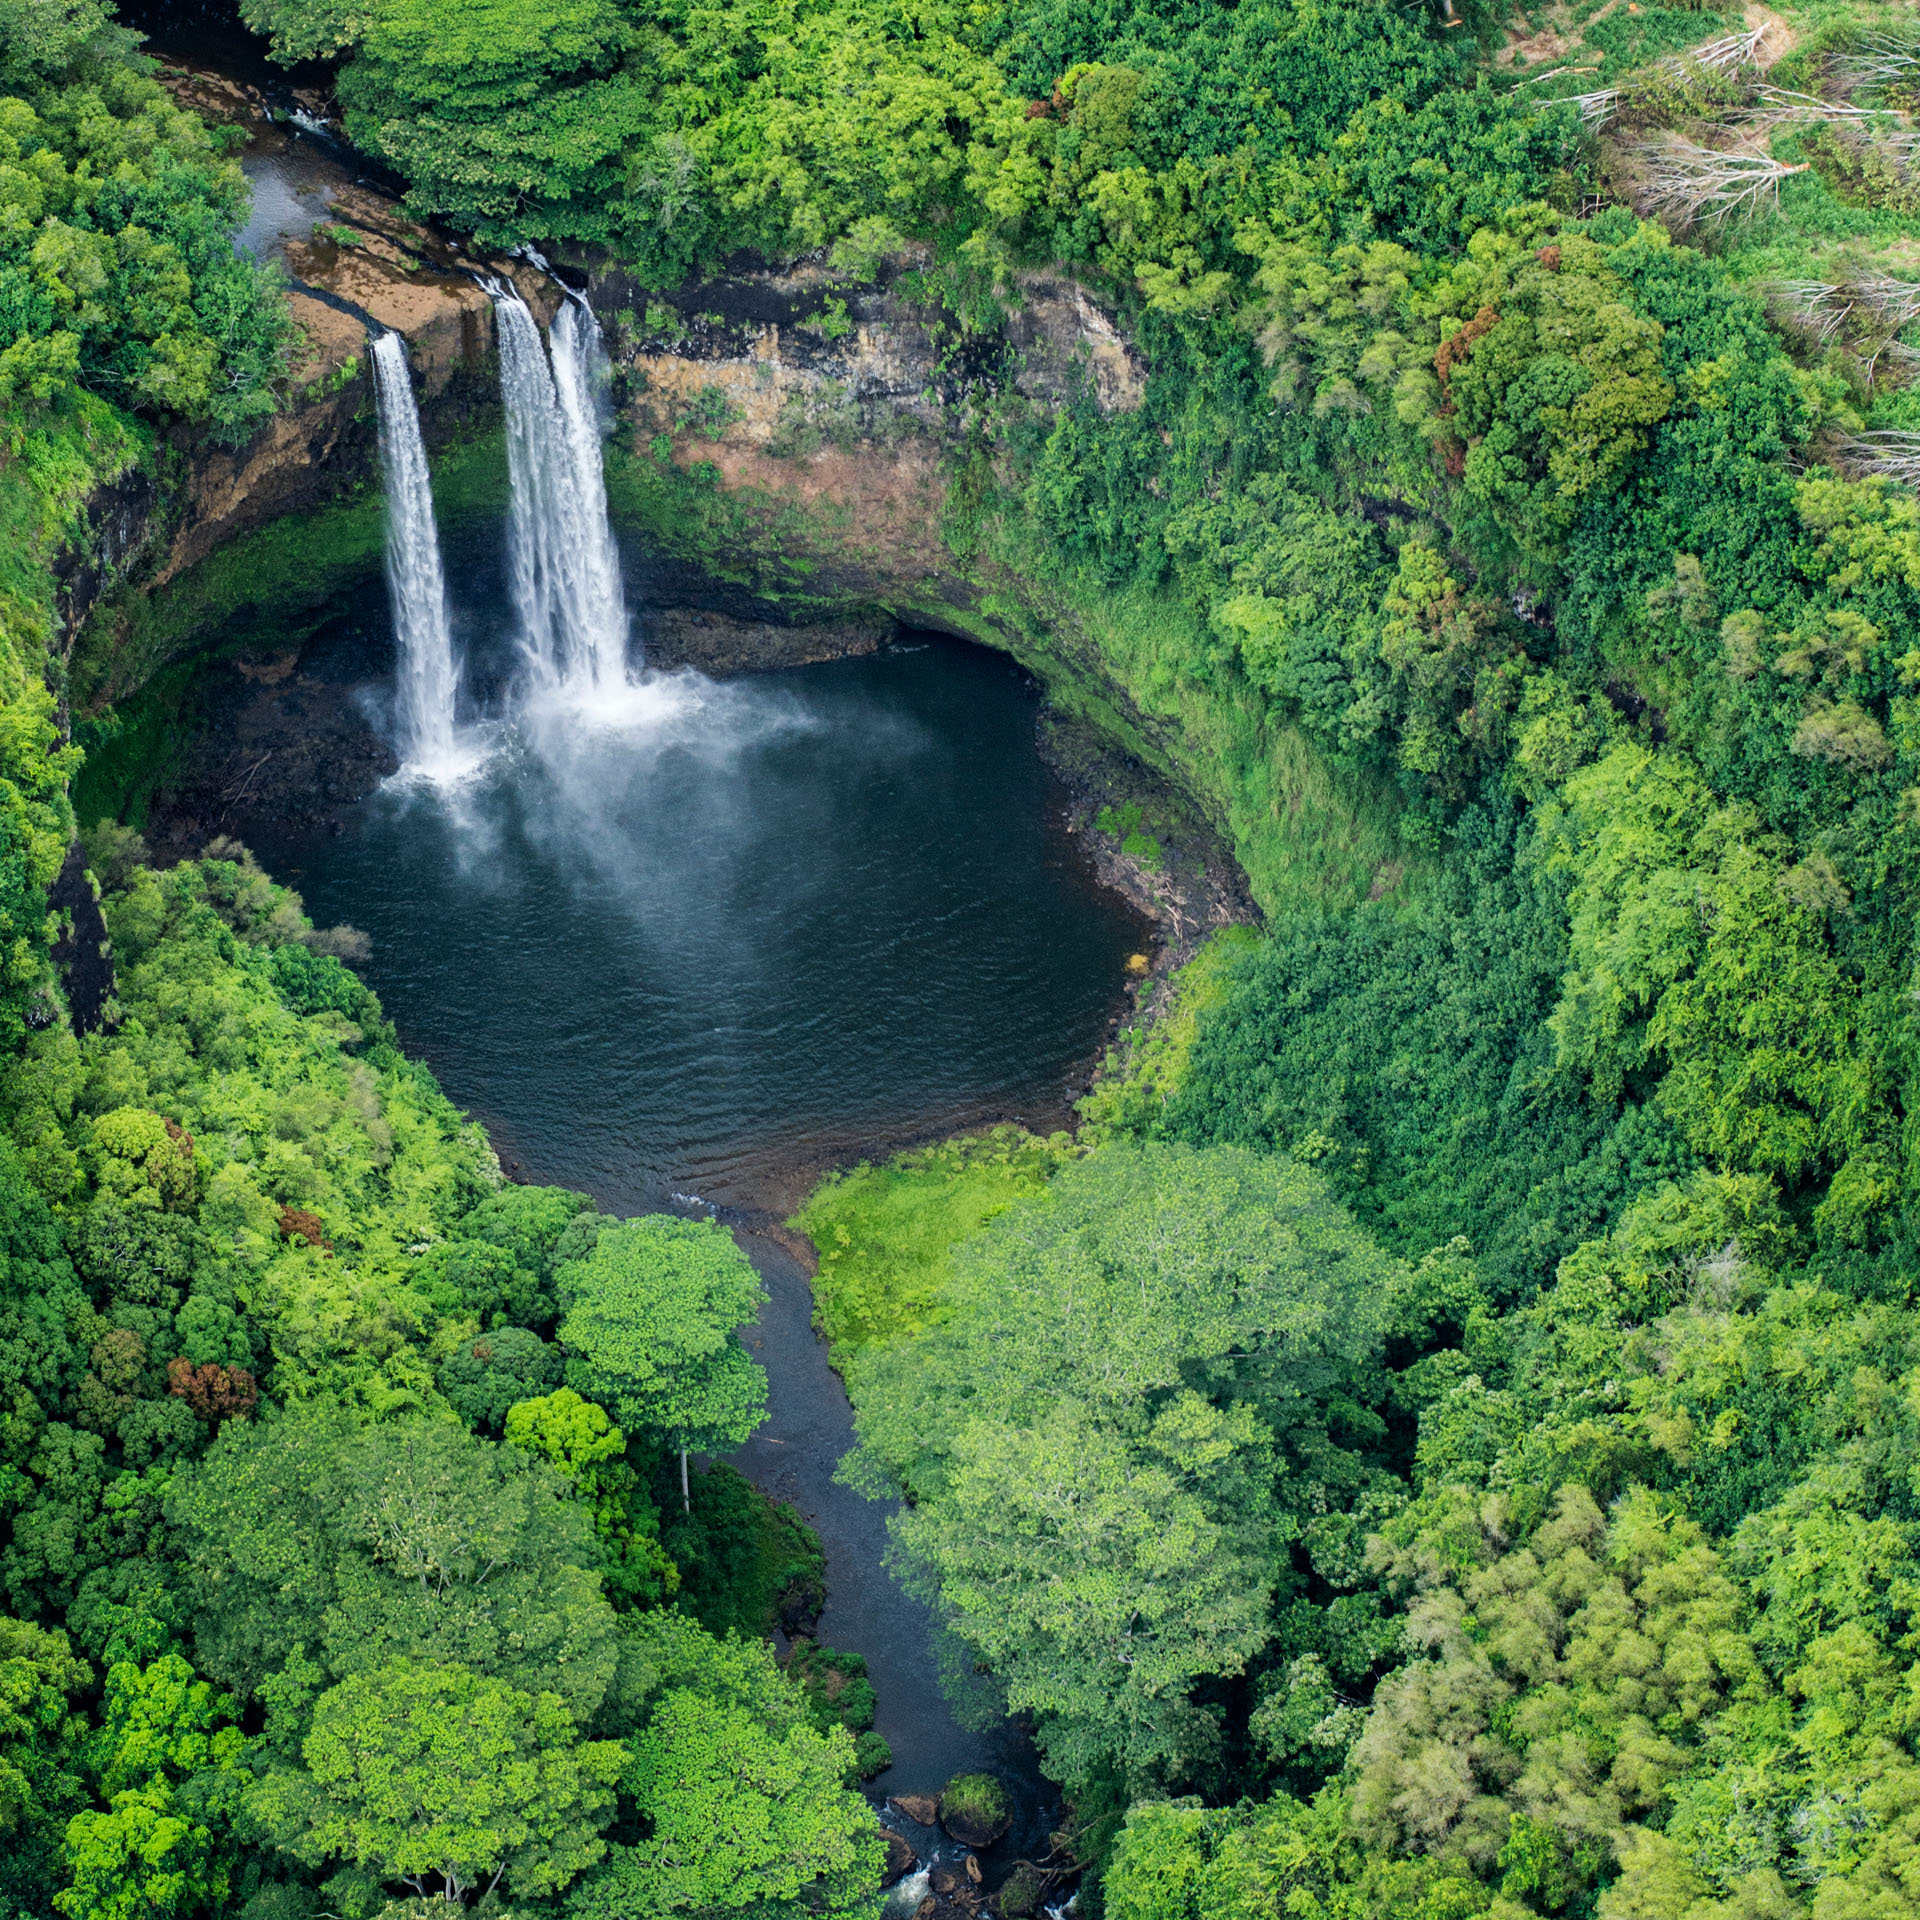 Rainbow Falls Hawaii Wallpaper 500px Blog 187 The Passionate Photographer Community 187 A